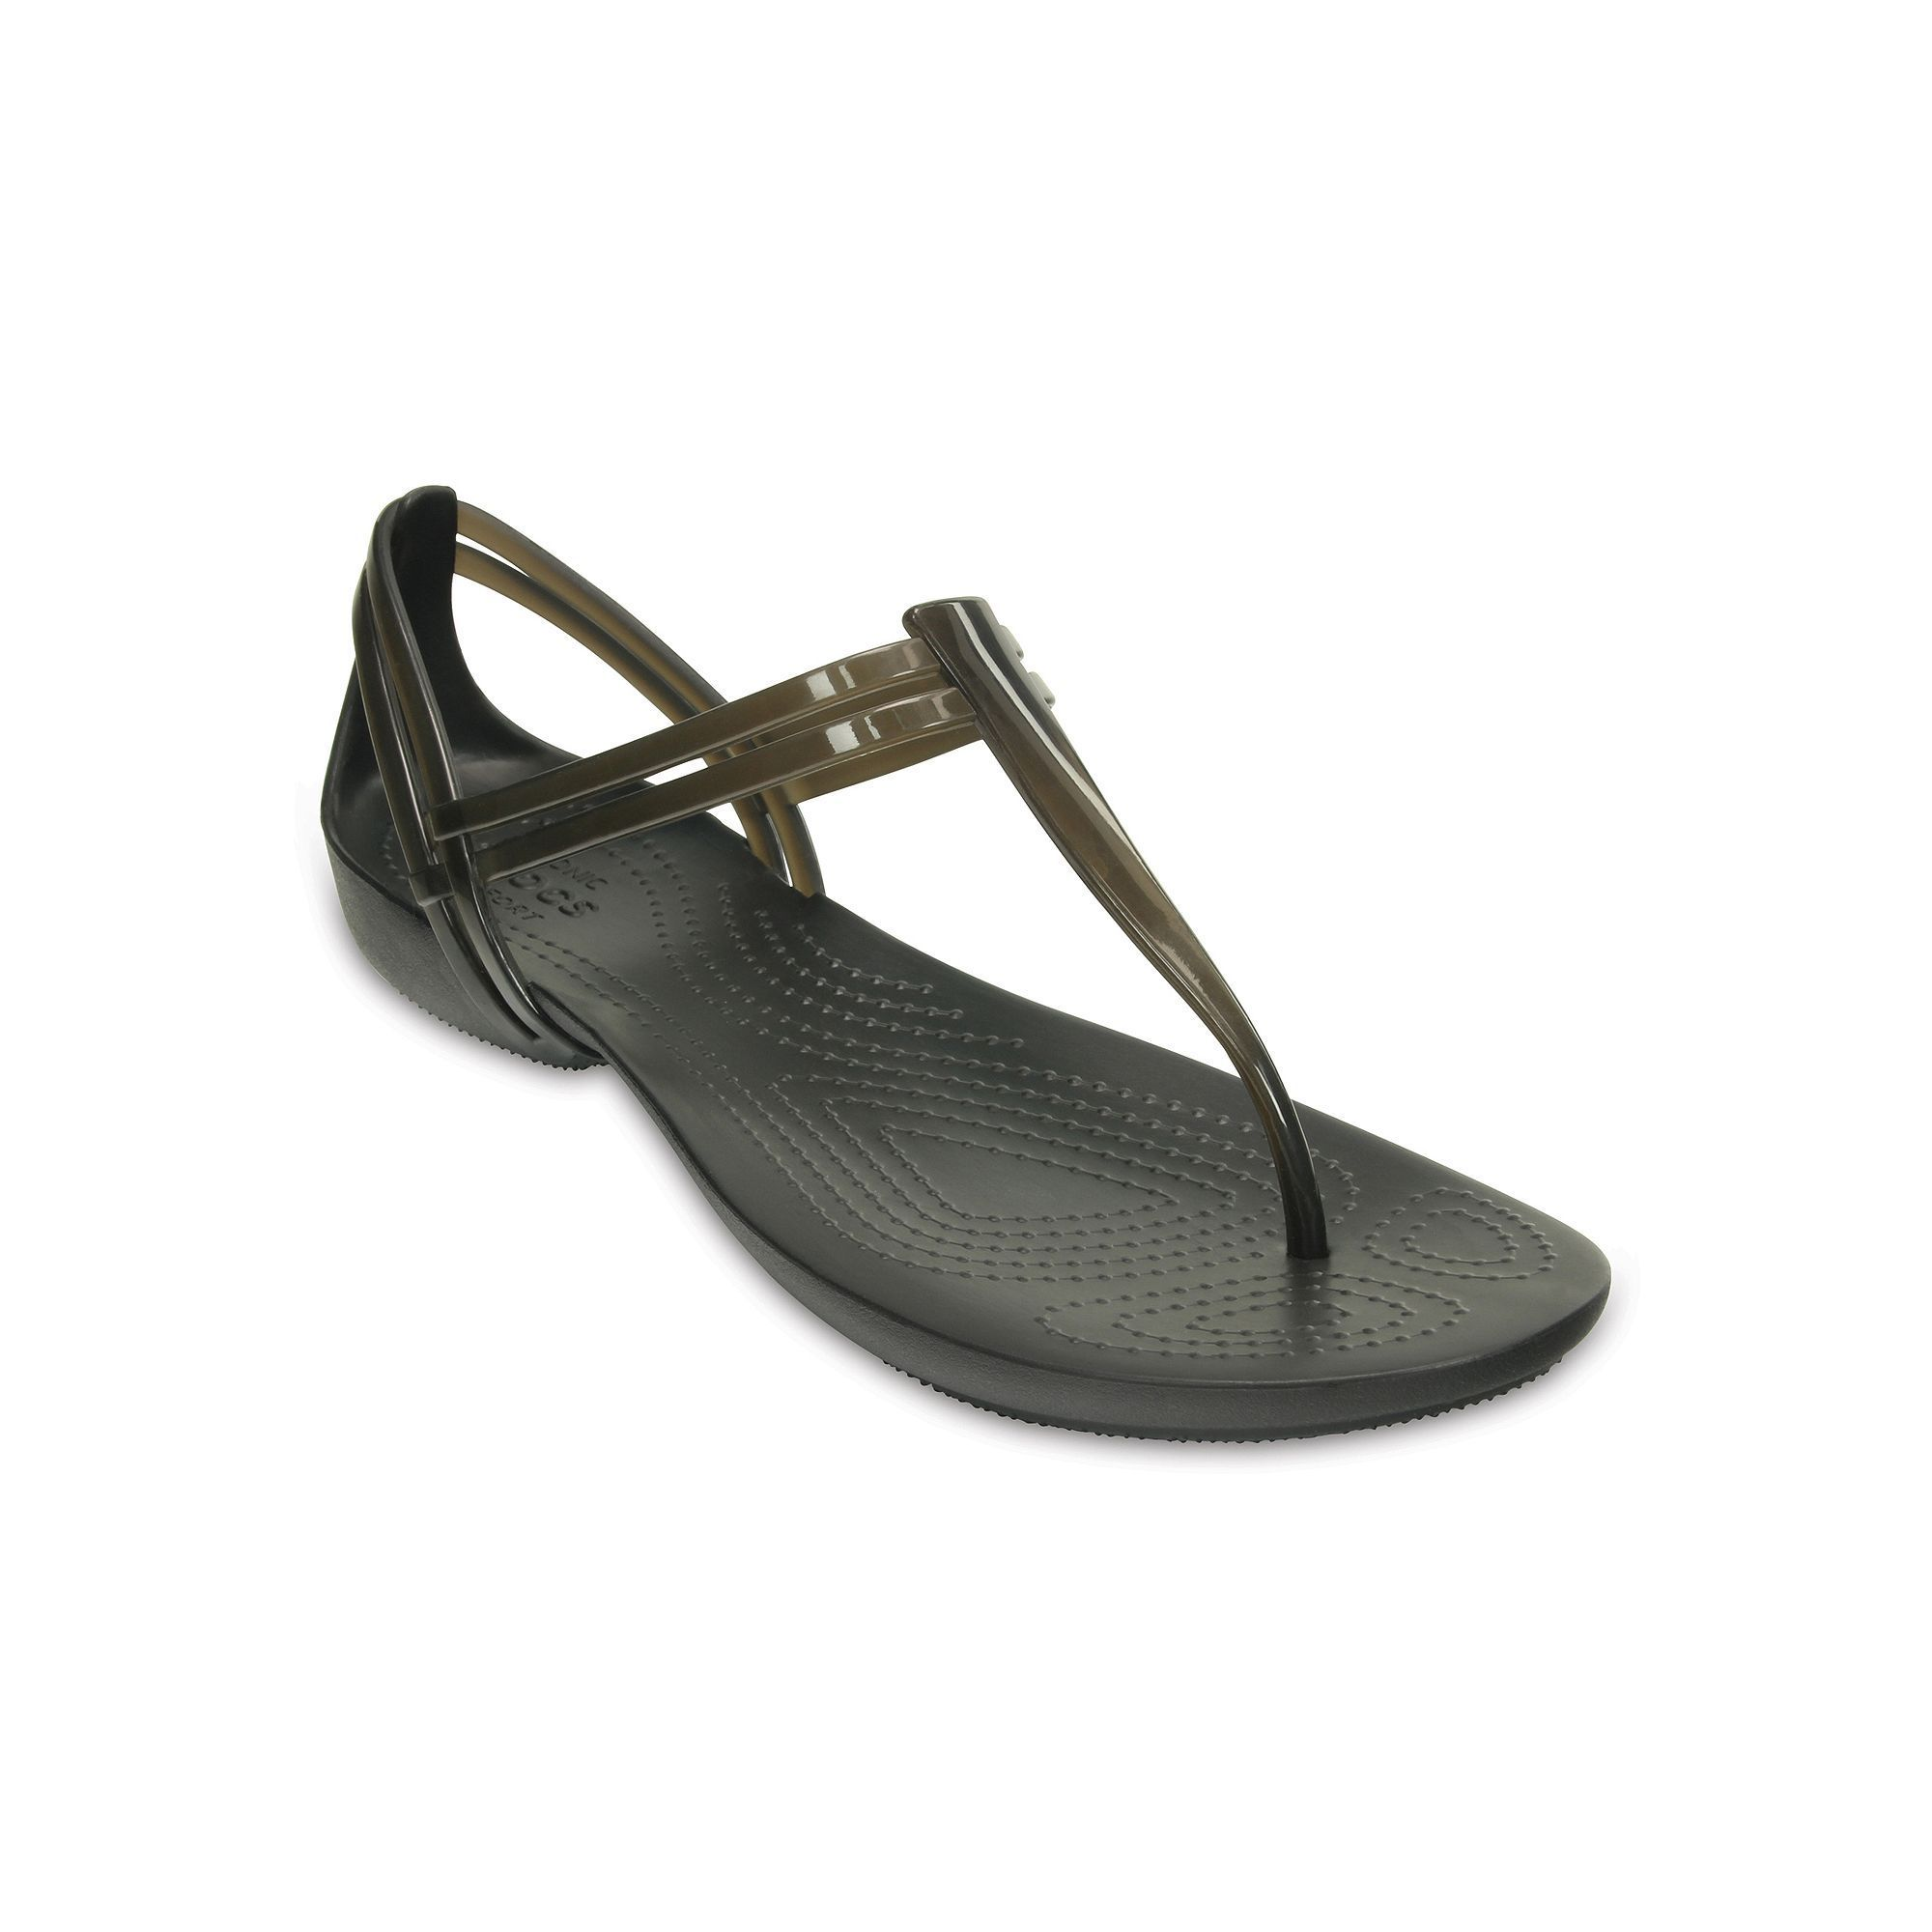 20cdc1582131 Crocs Isabella Women s T-Strap Sandals